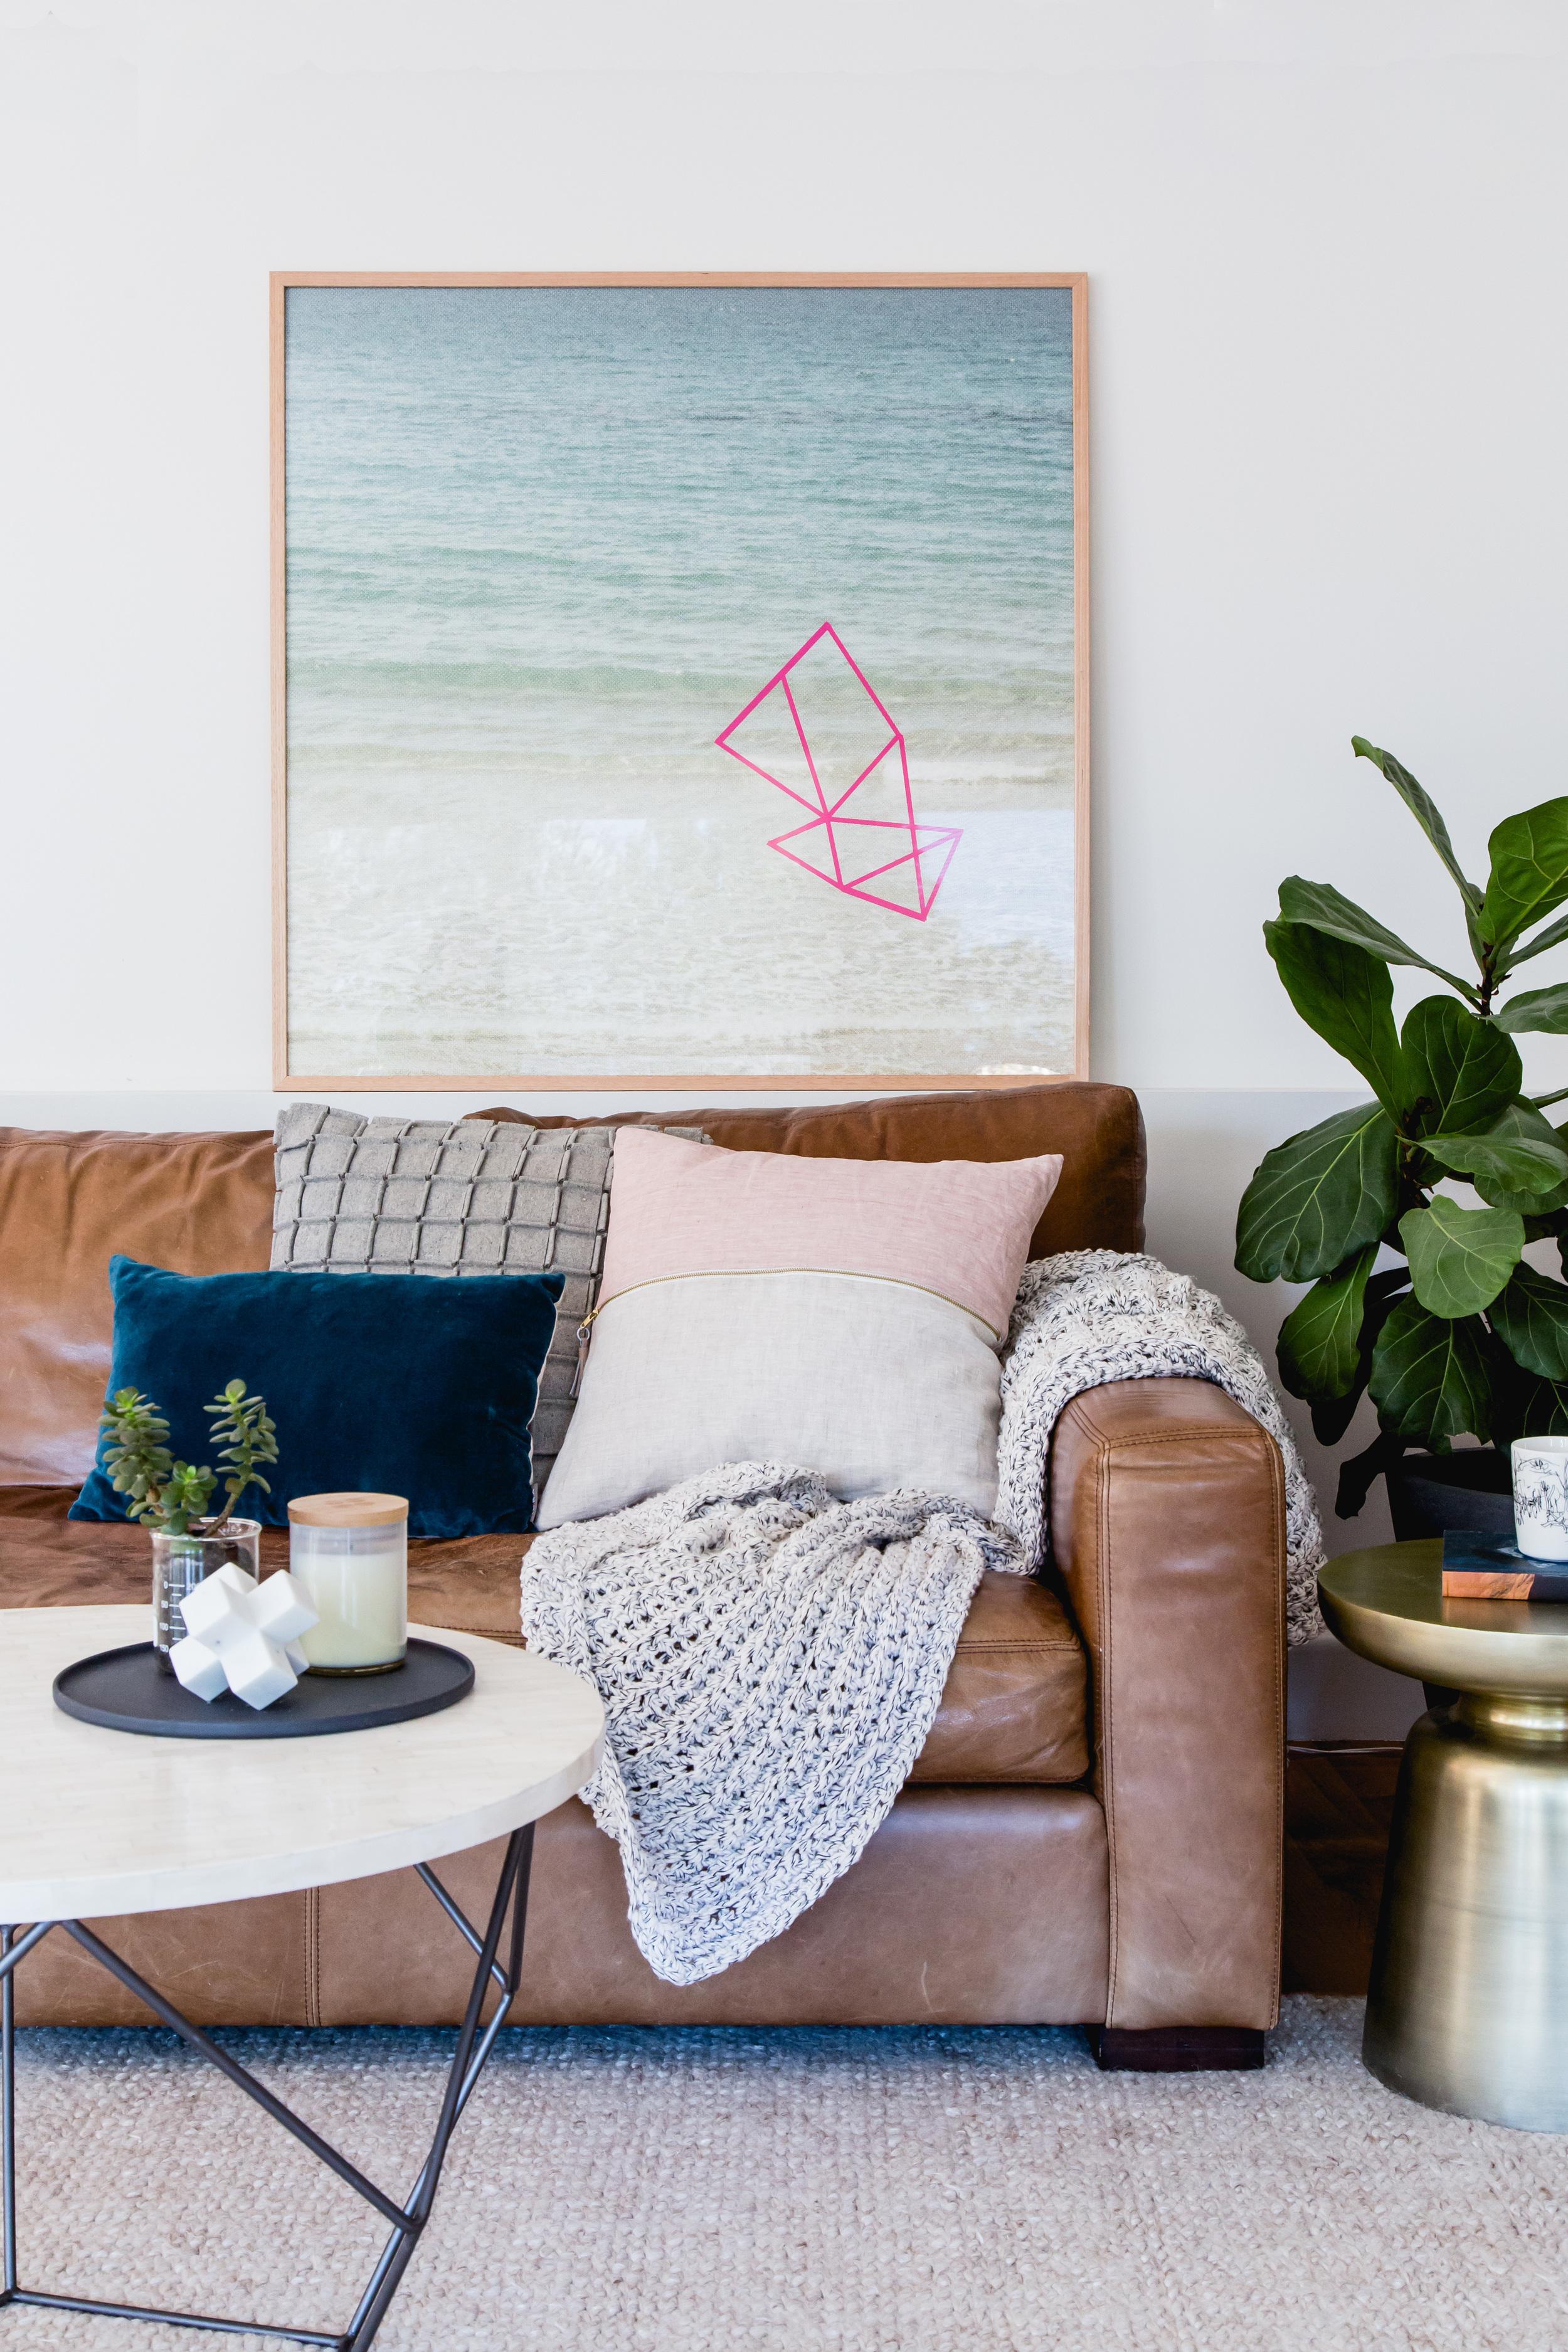 Styling by Julianne Bull / The Den Interiors